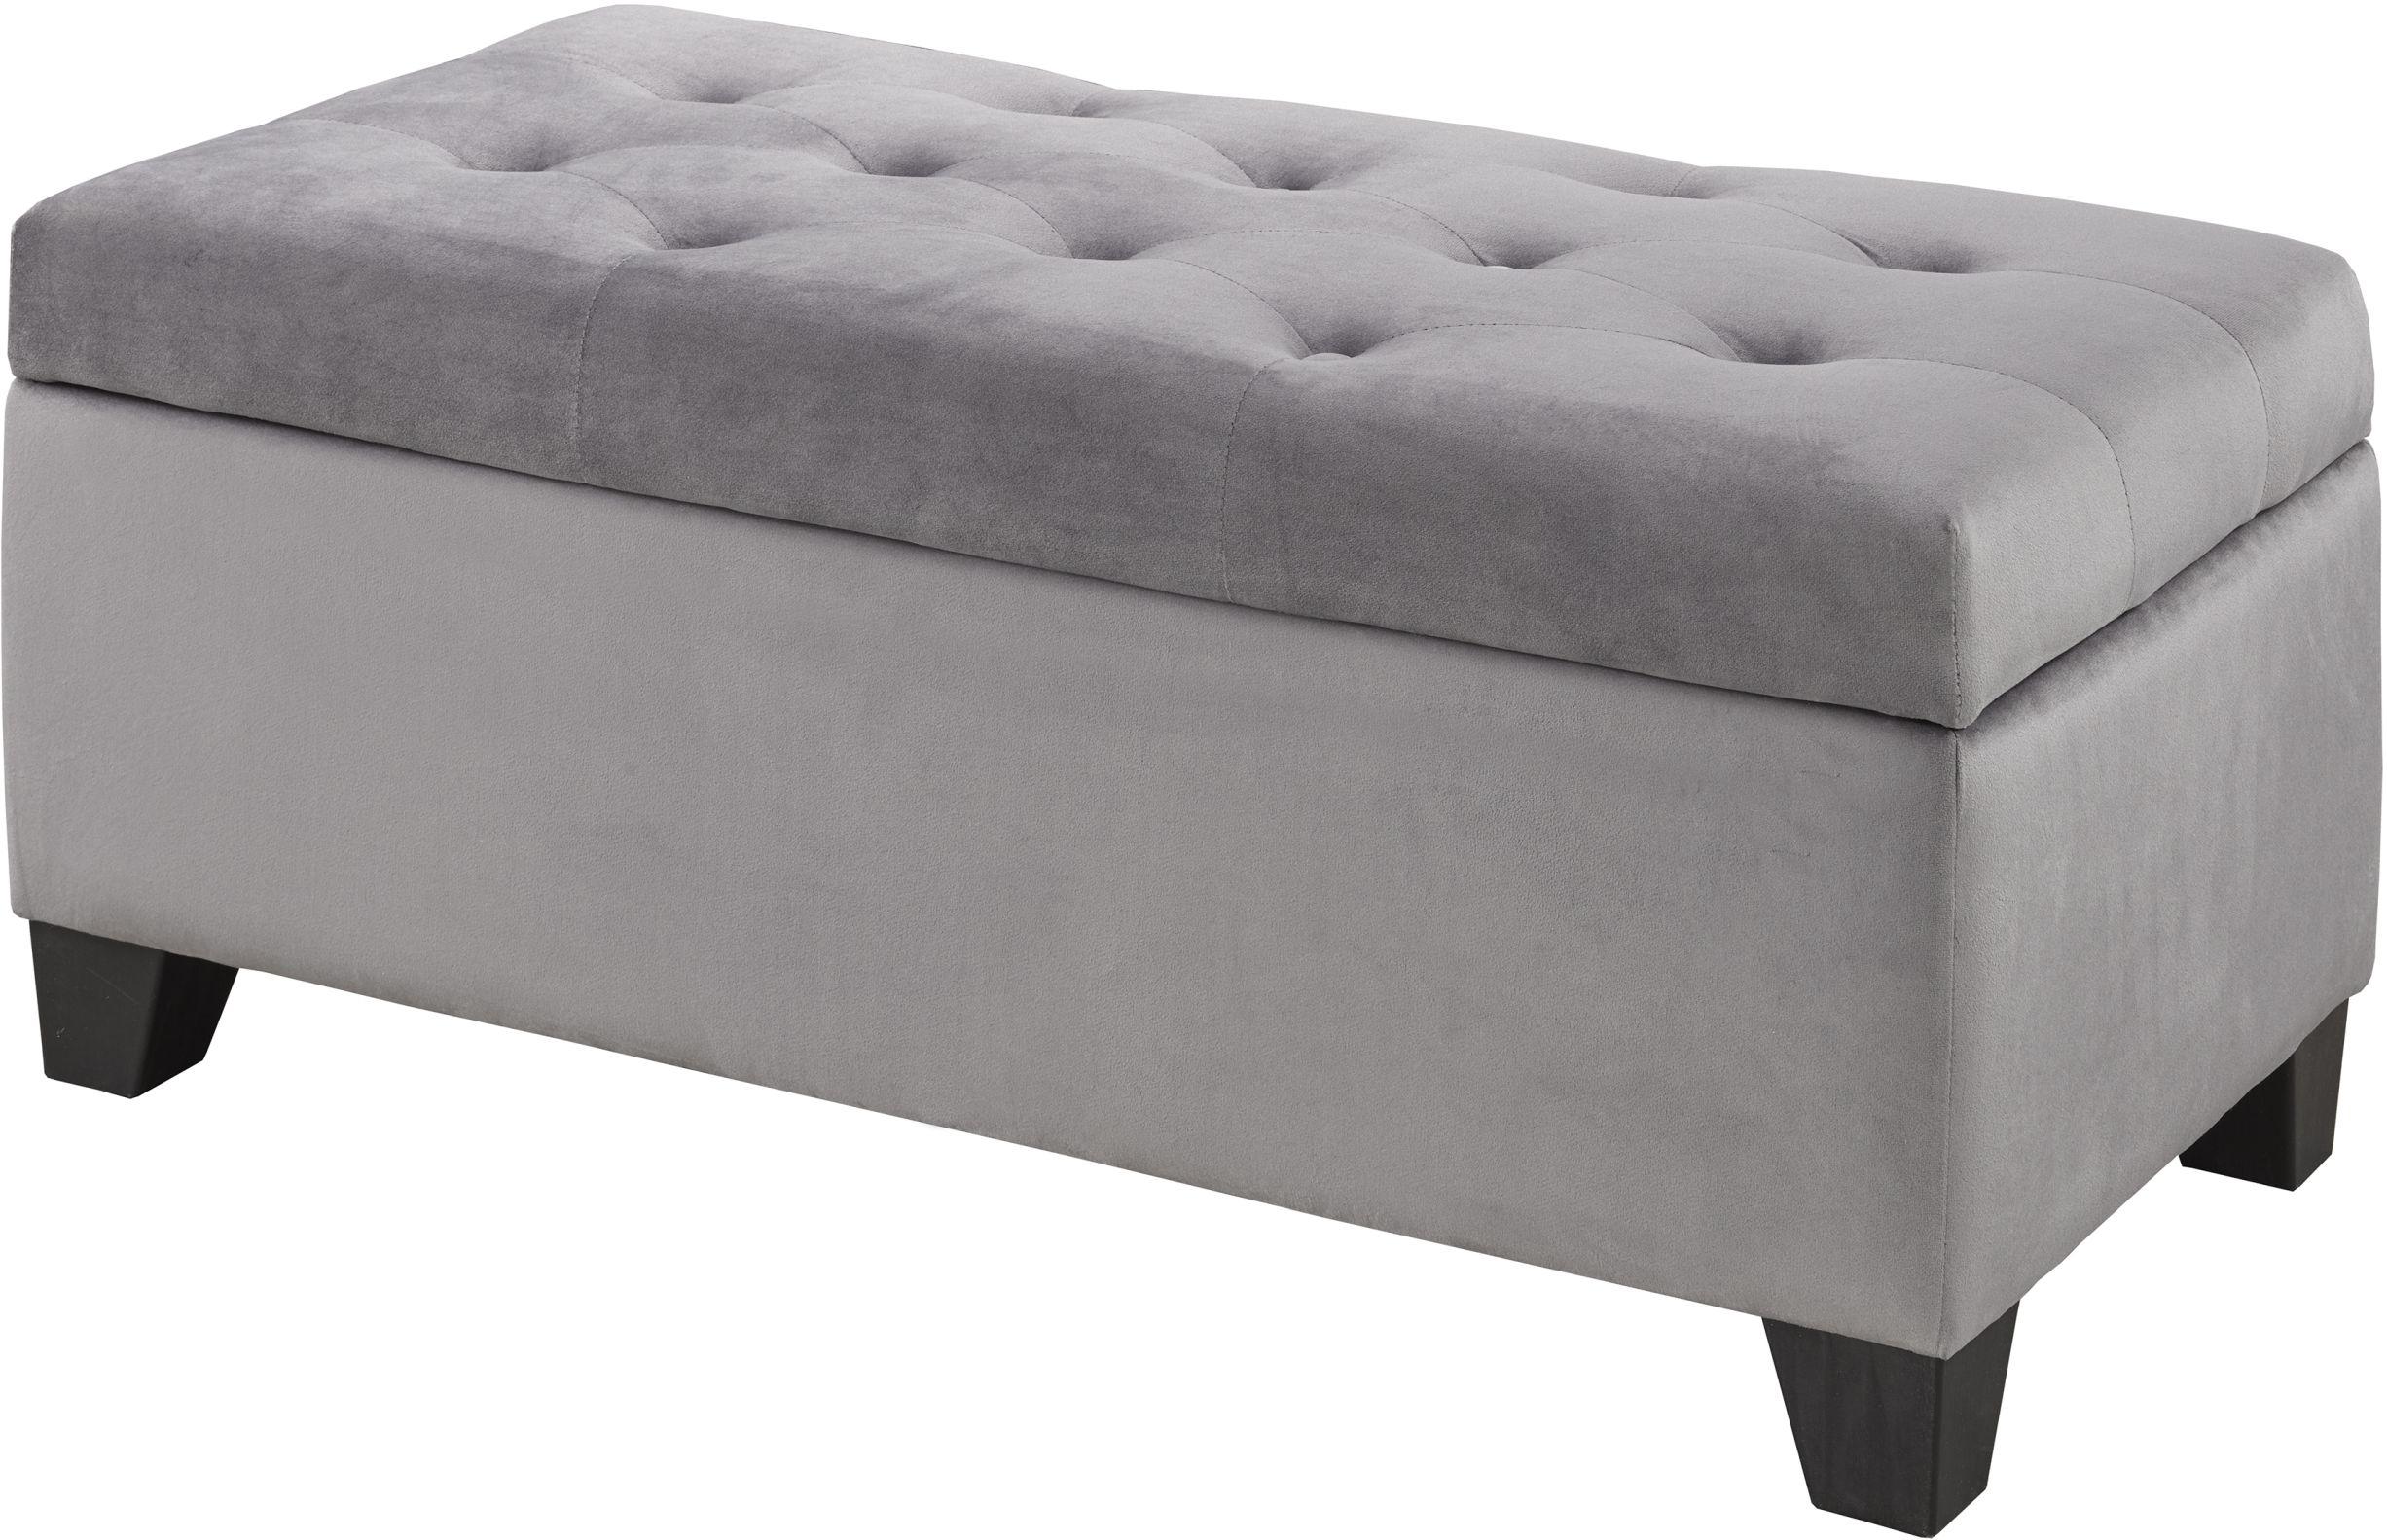 brassex tufted storage ottoman grey br 22291 gr modern furniture canada